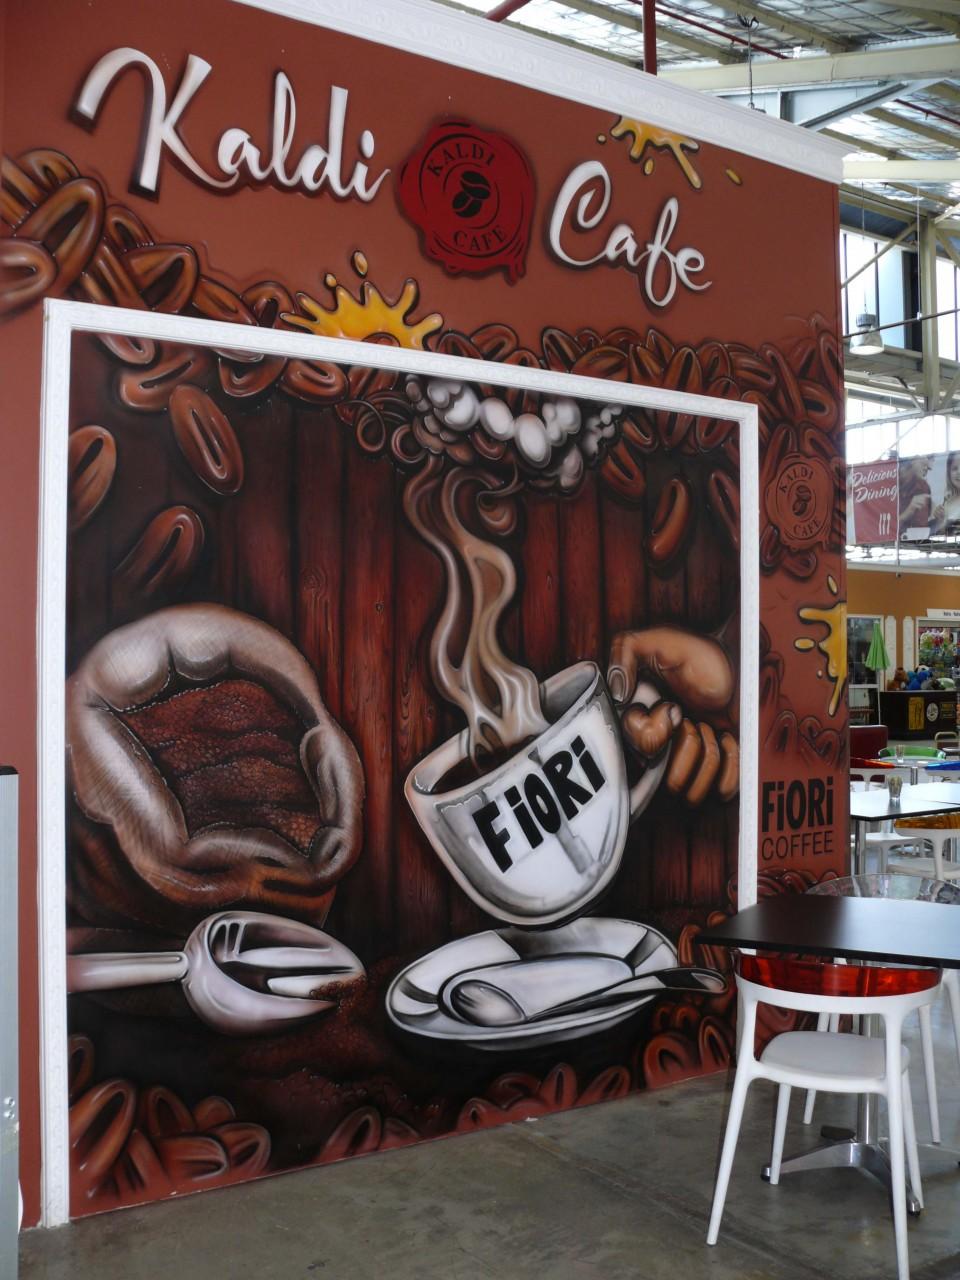 airbrush art-airbrush art perth-airbrush perth-airbrush murals-airbrush signs-signs-airbrush graphics-Kaldi Cafe3